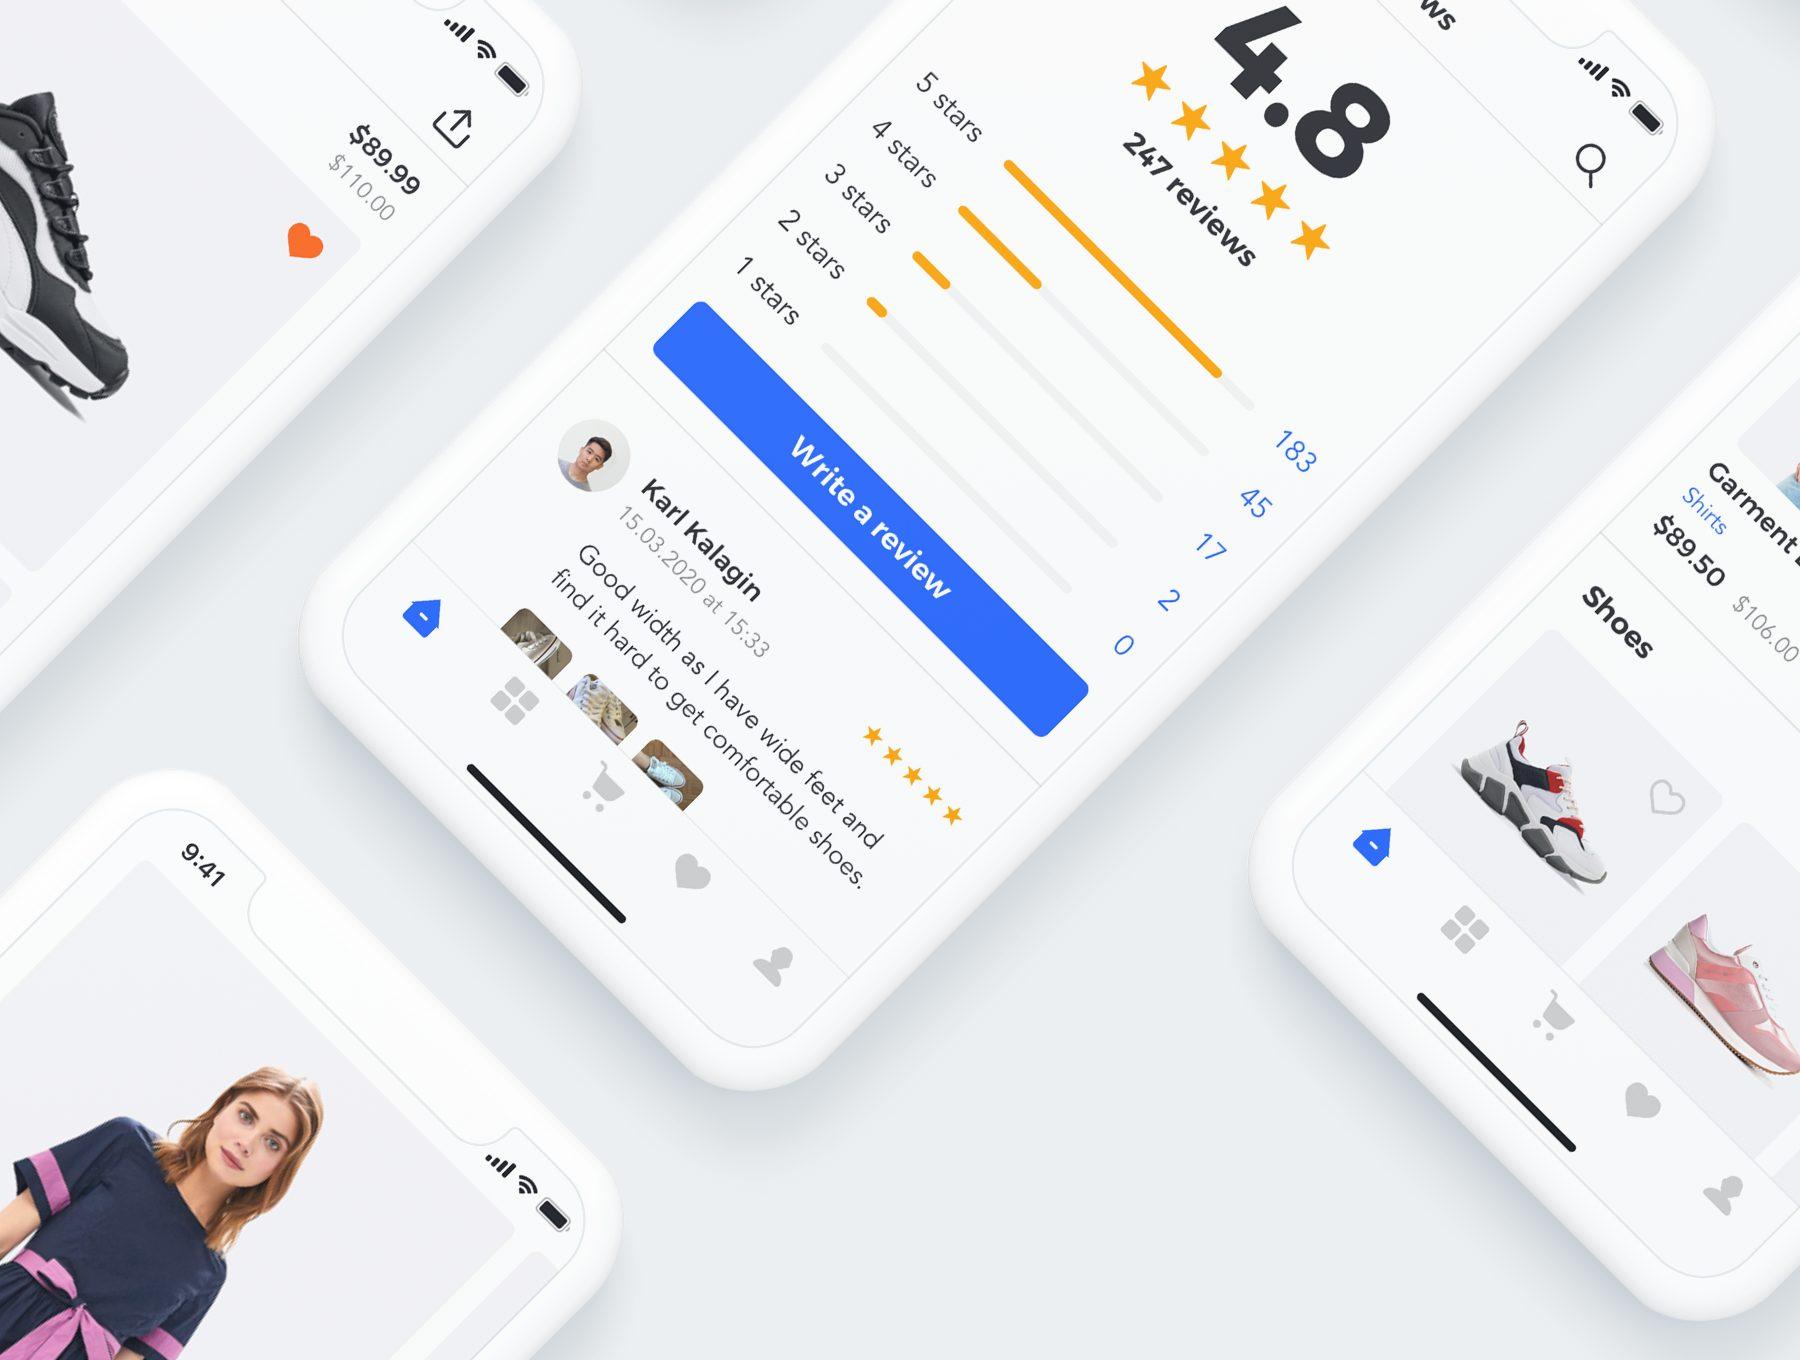 时尚服饰电商APP UI KIT套装 app设计iOS Ui[Sketch,XD] Sector UI Kit E commerce